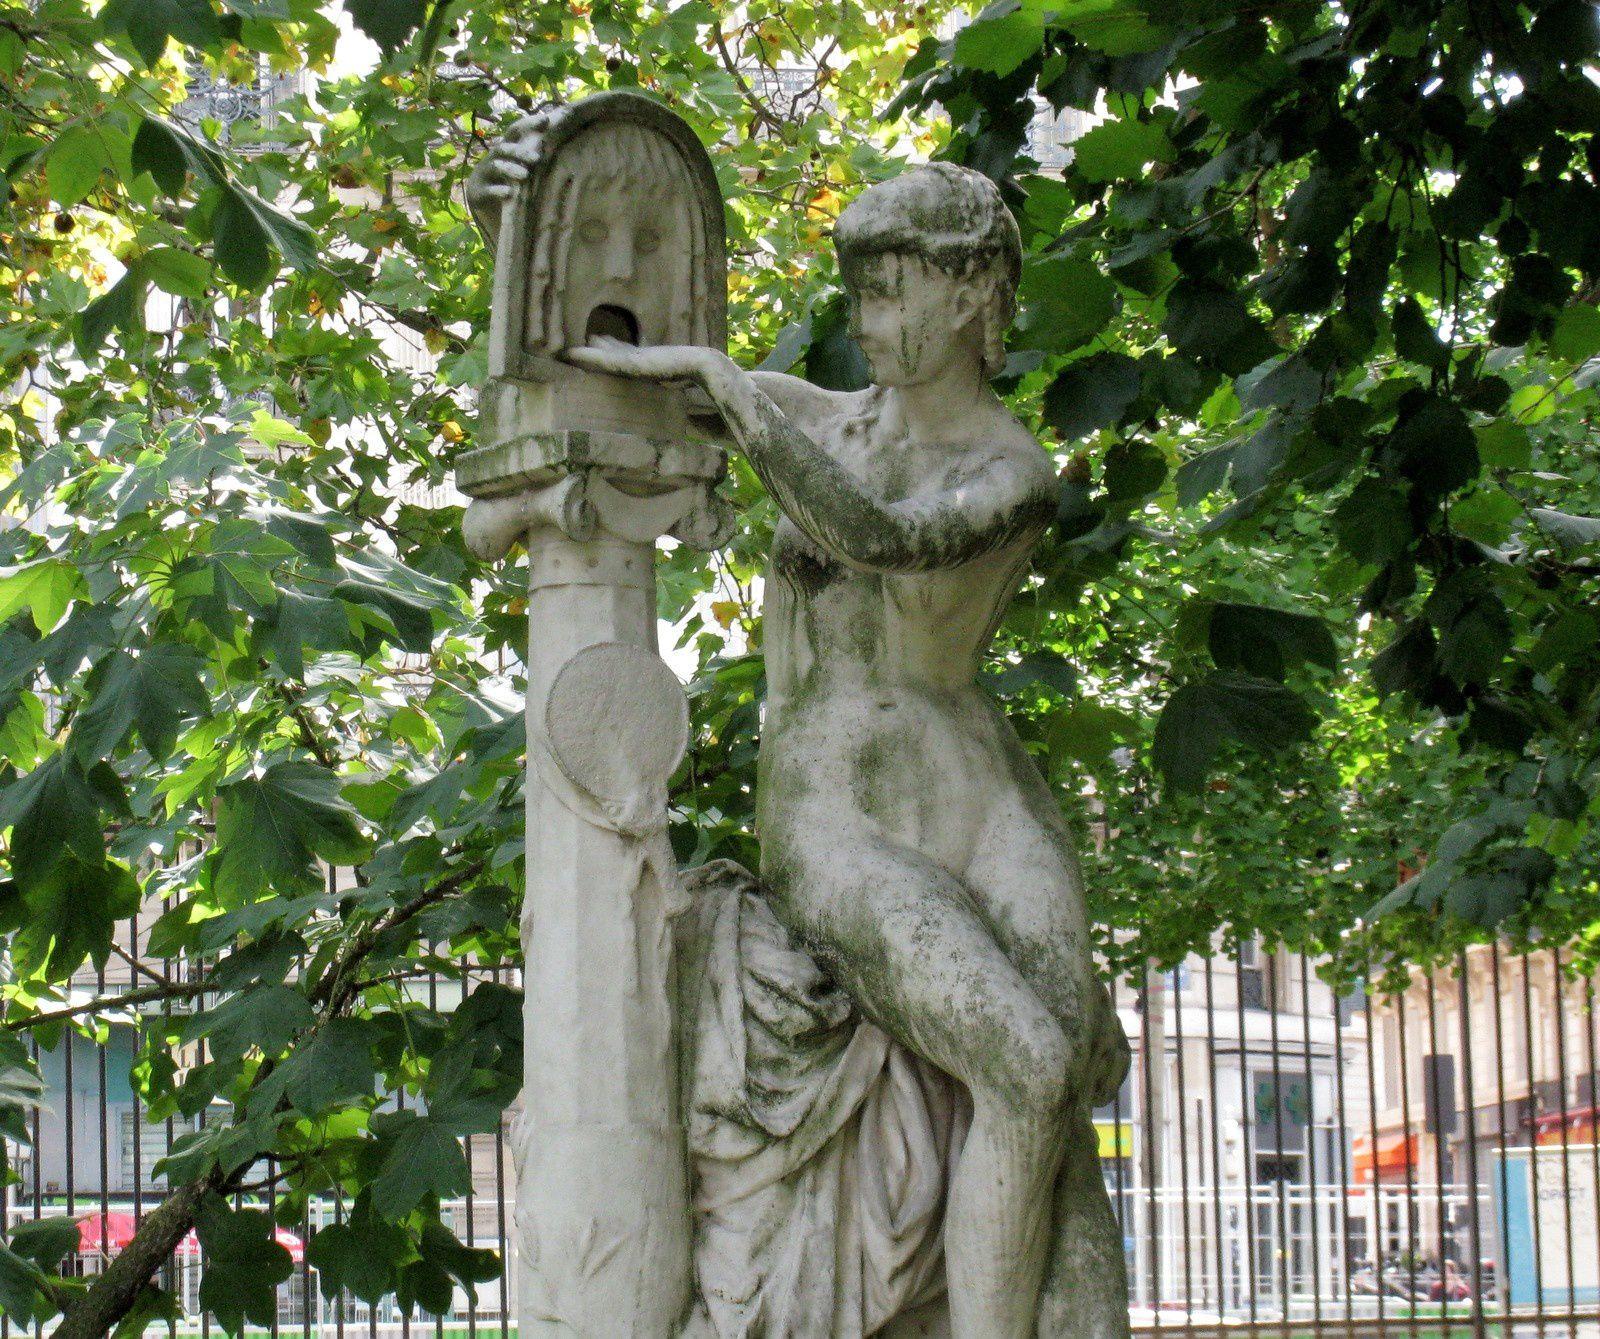 La Bocca della verita, sculpture de Jules Blanchard